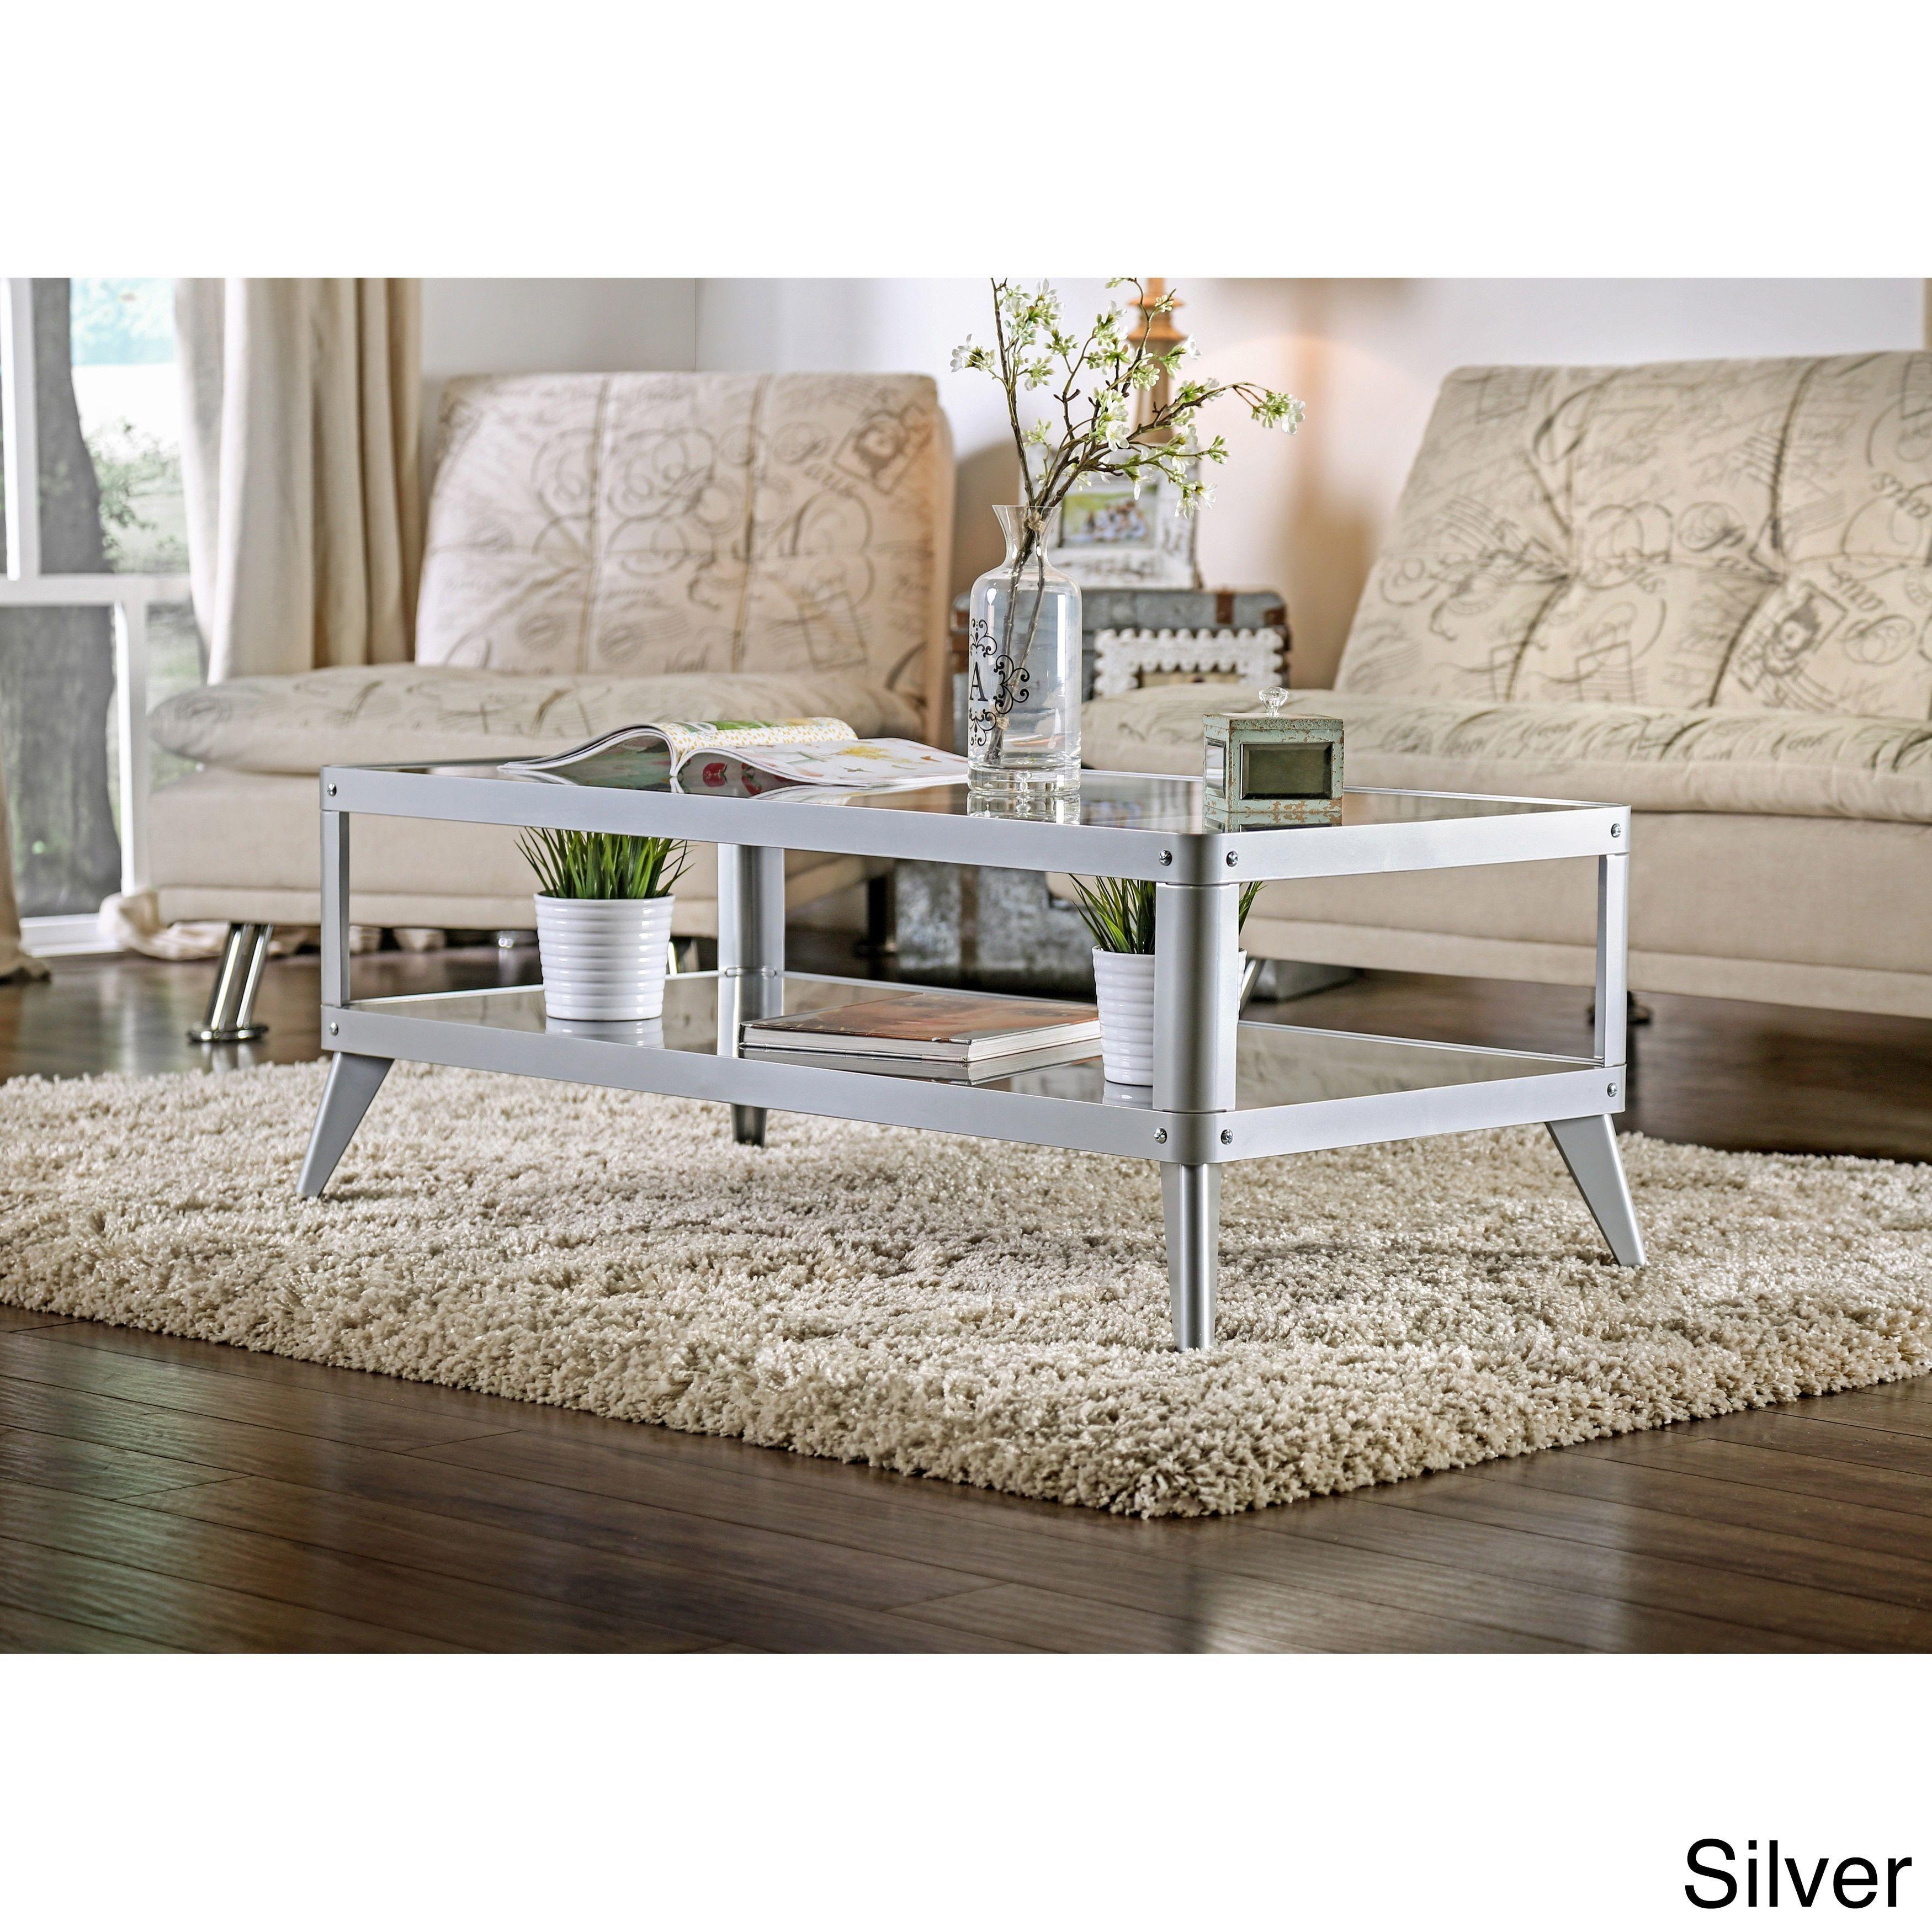 Furniture of America Linden Modern Glass Top Metal Coffee Table